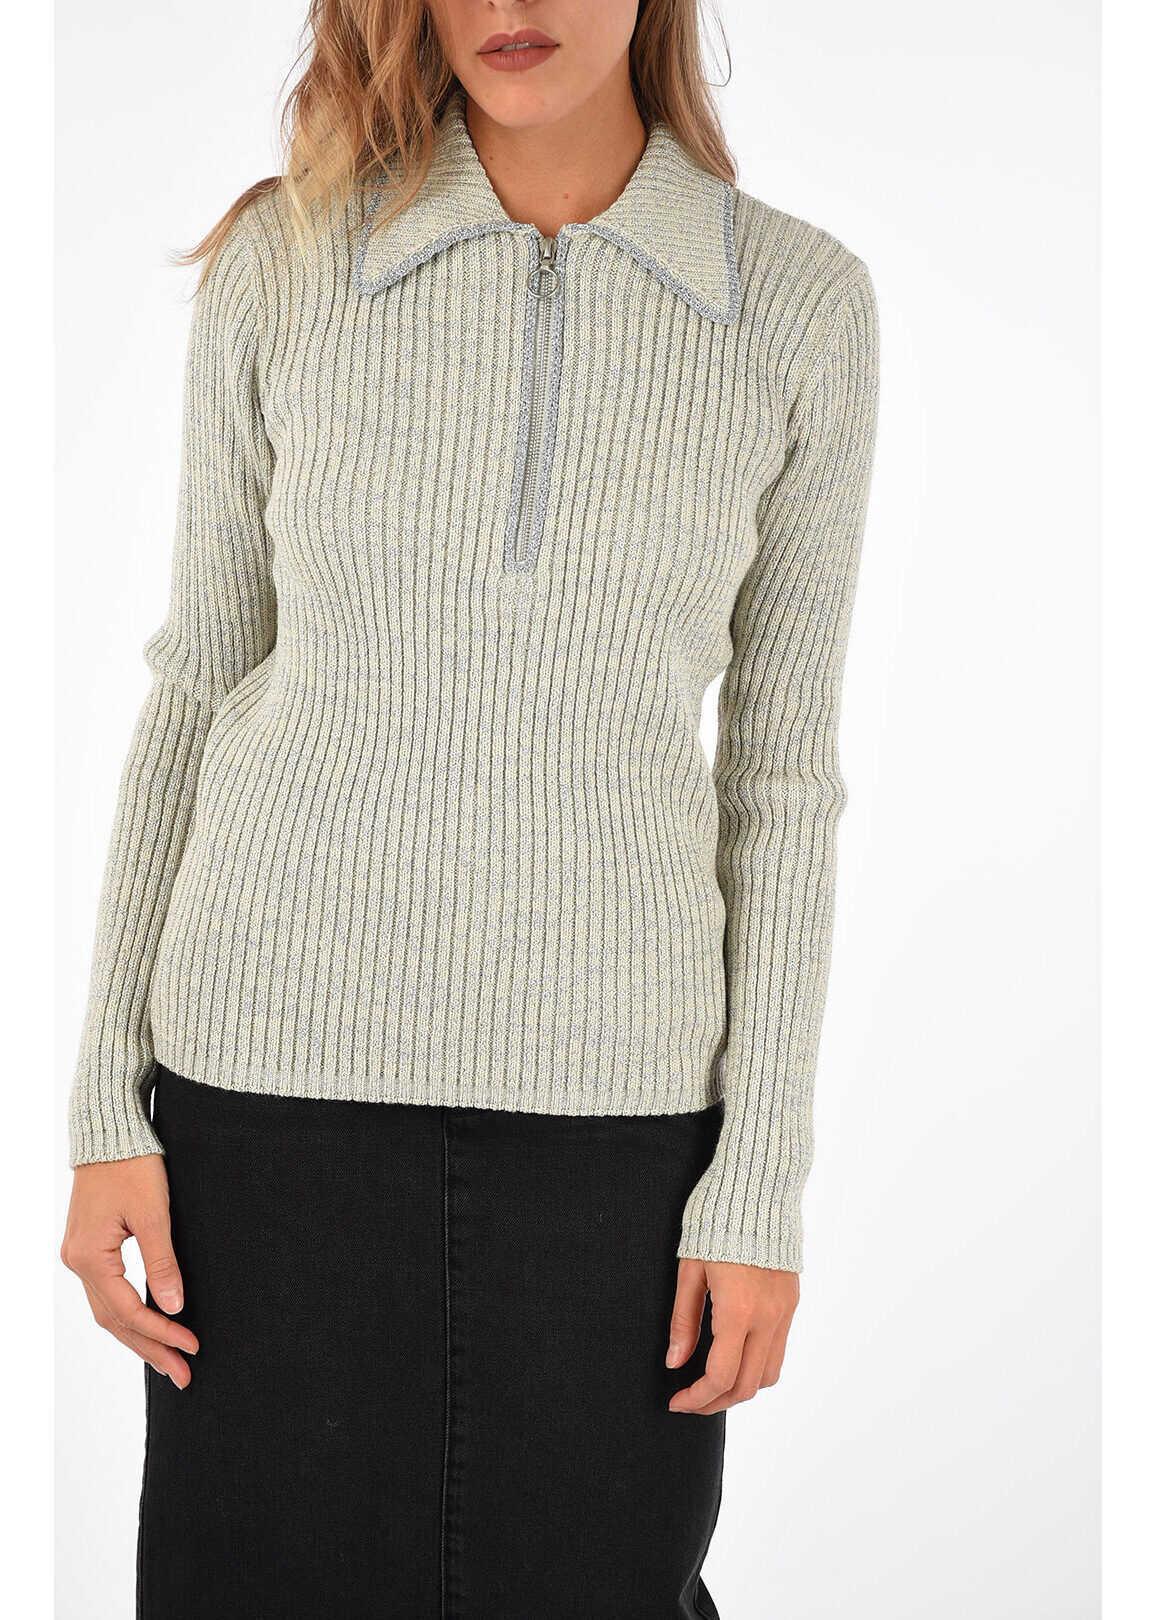 Dries Van Noten Glitter Sweater MATCH BEIGE